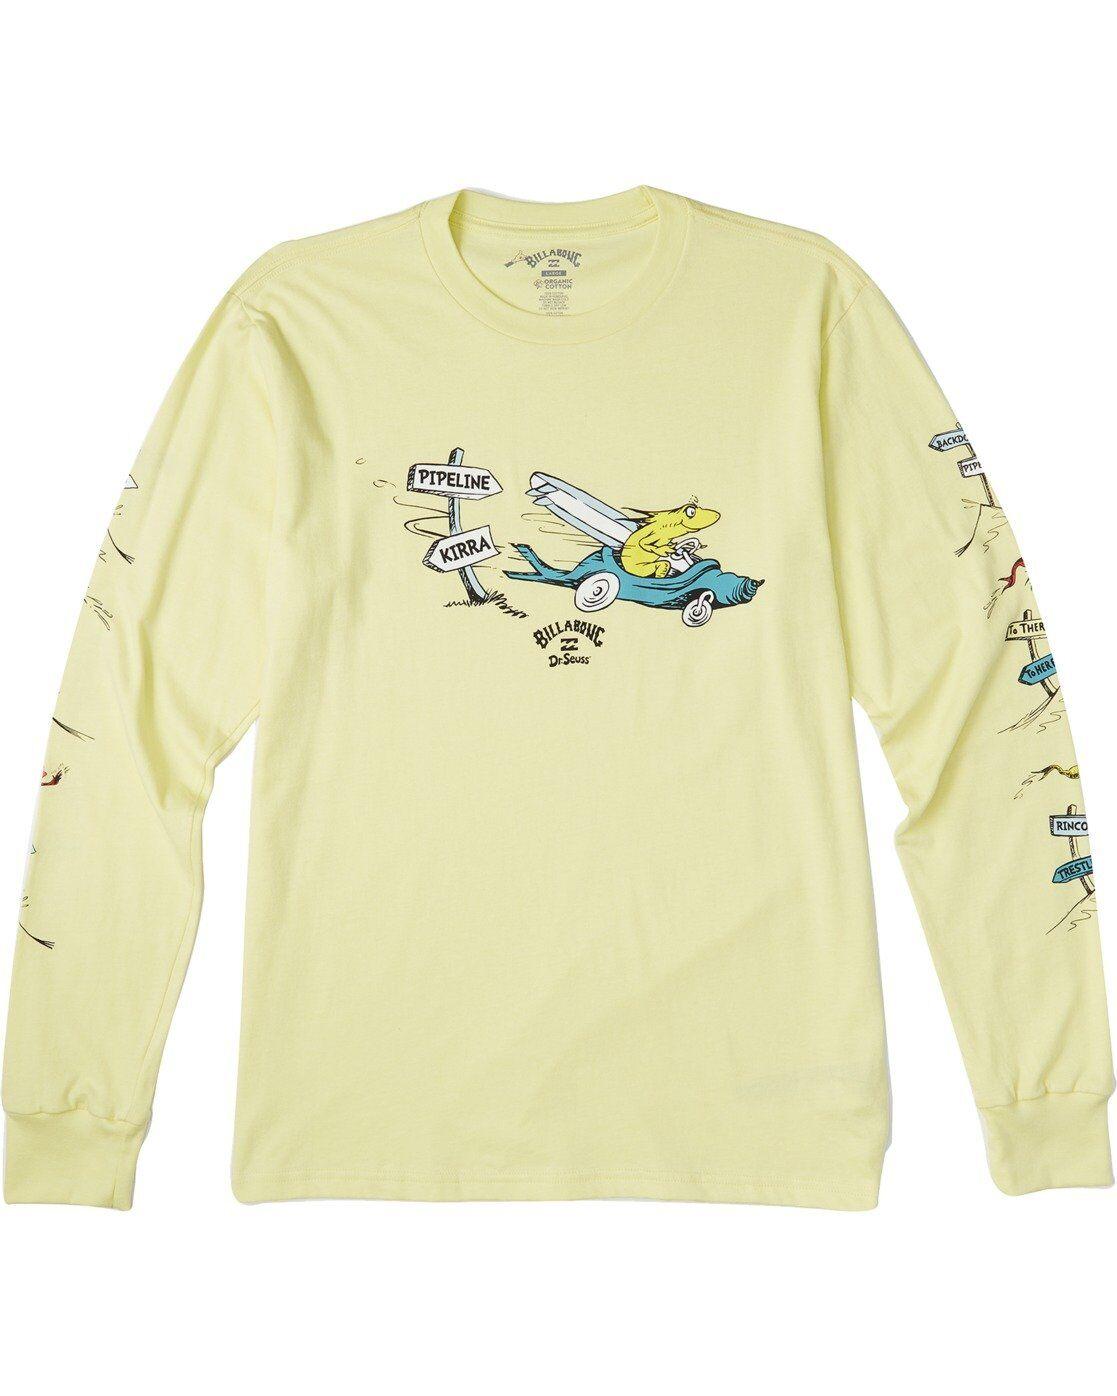 Billabong Boys' (2-7) Little Car Long Sleeve T-Shirt  - Yellow - Size: Extra Large